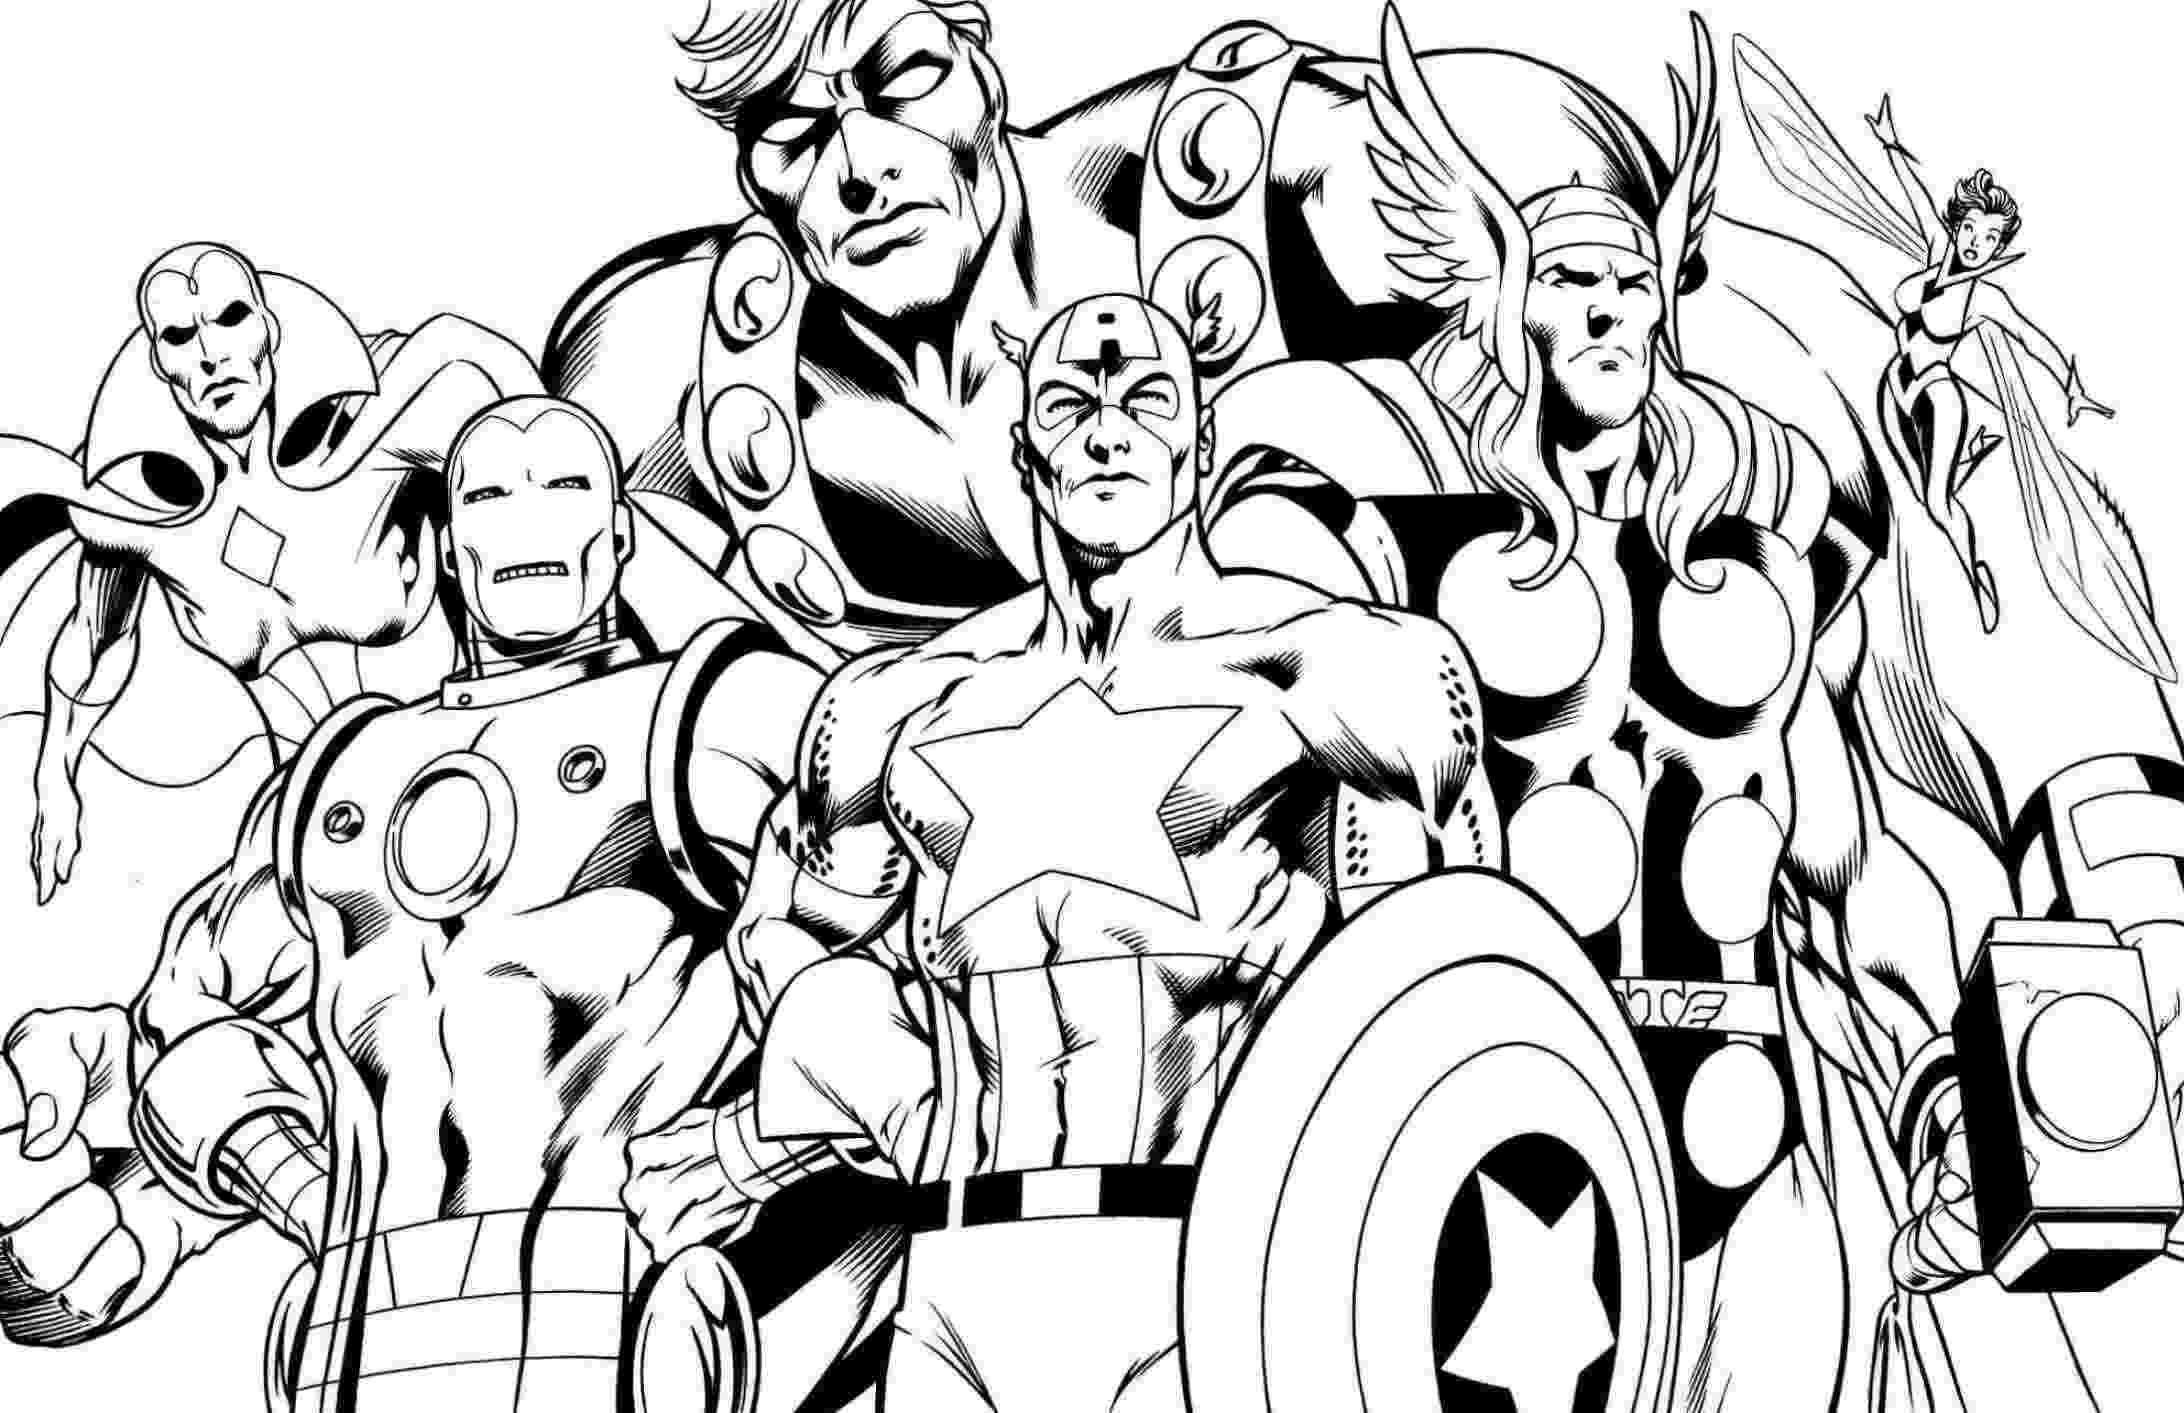 superhero color pages superhero coloring pictures pages superhero color